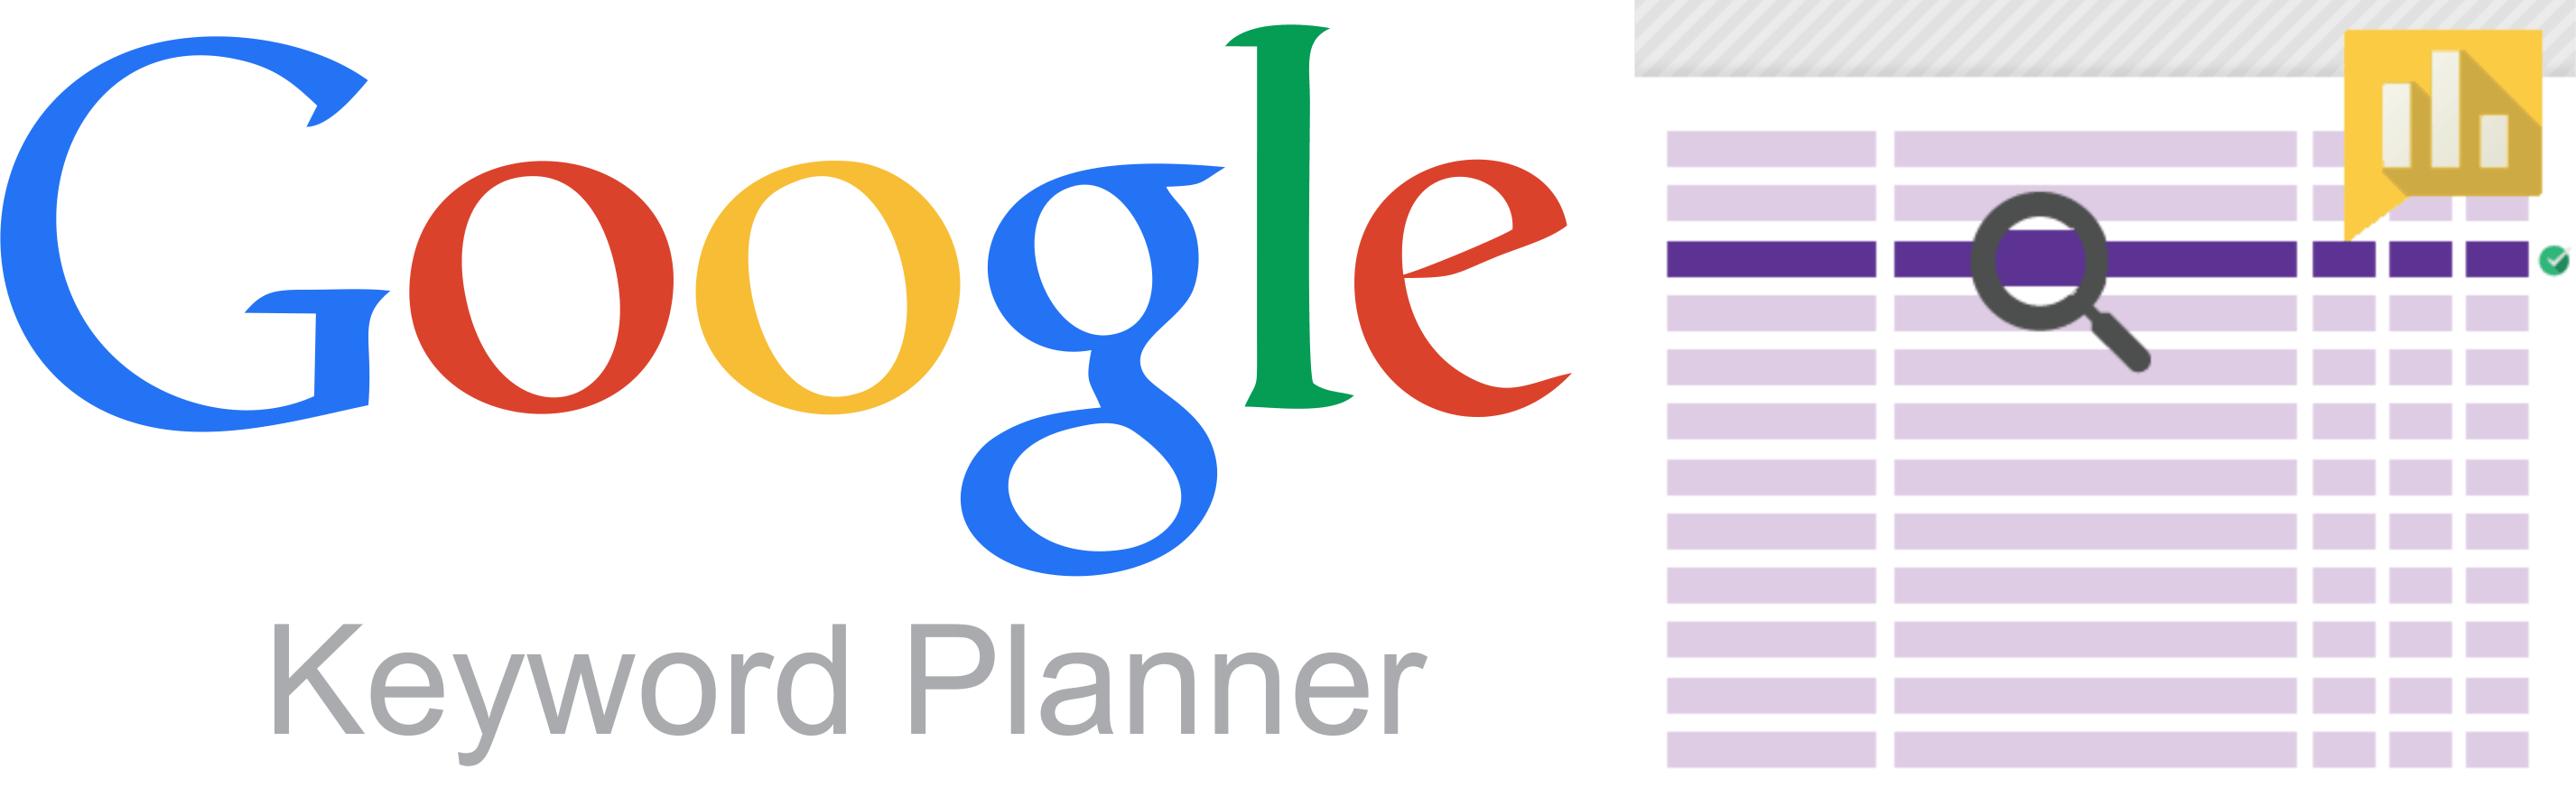 Come Accedere a Google Keyword Planner gratuitamente